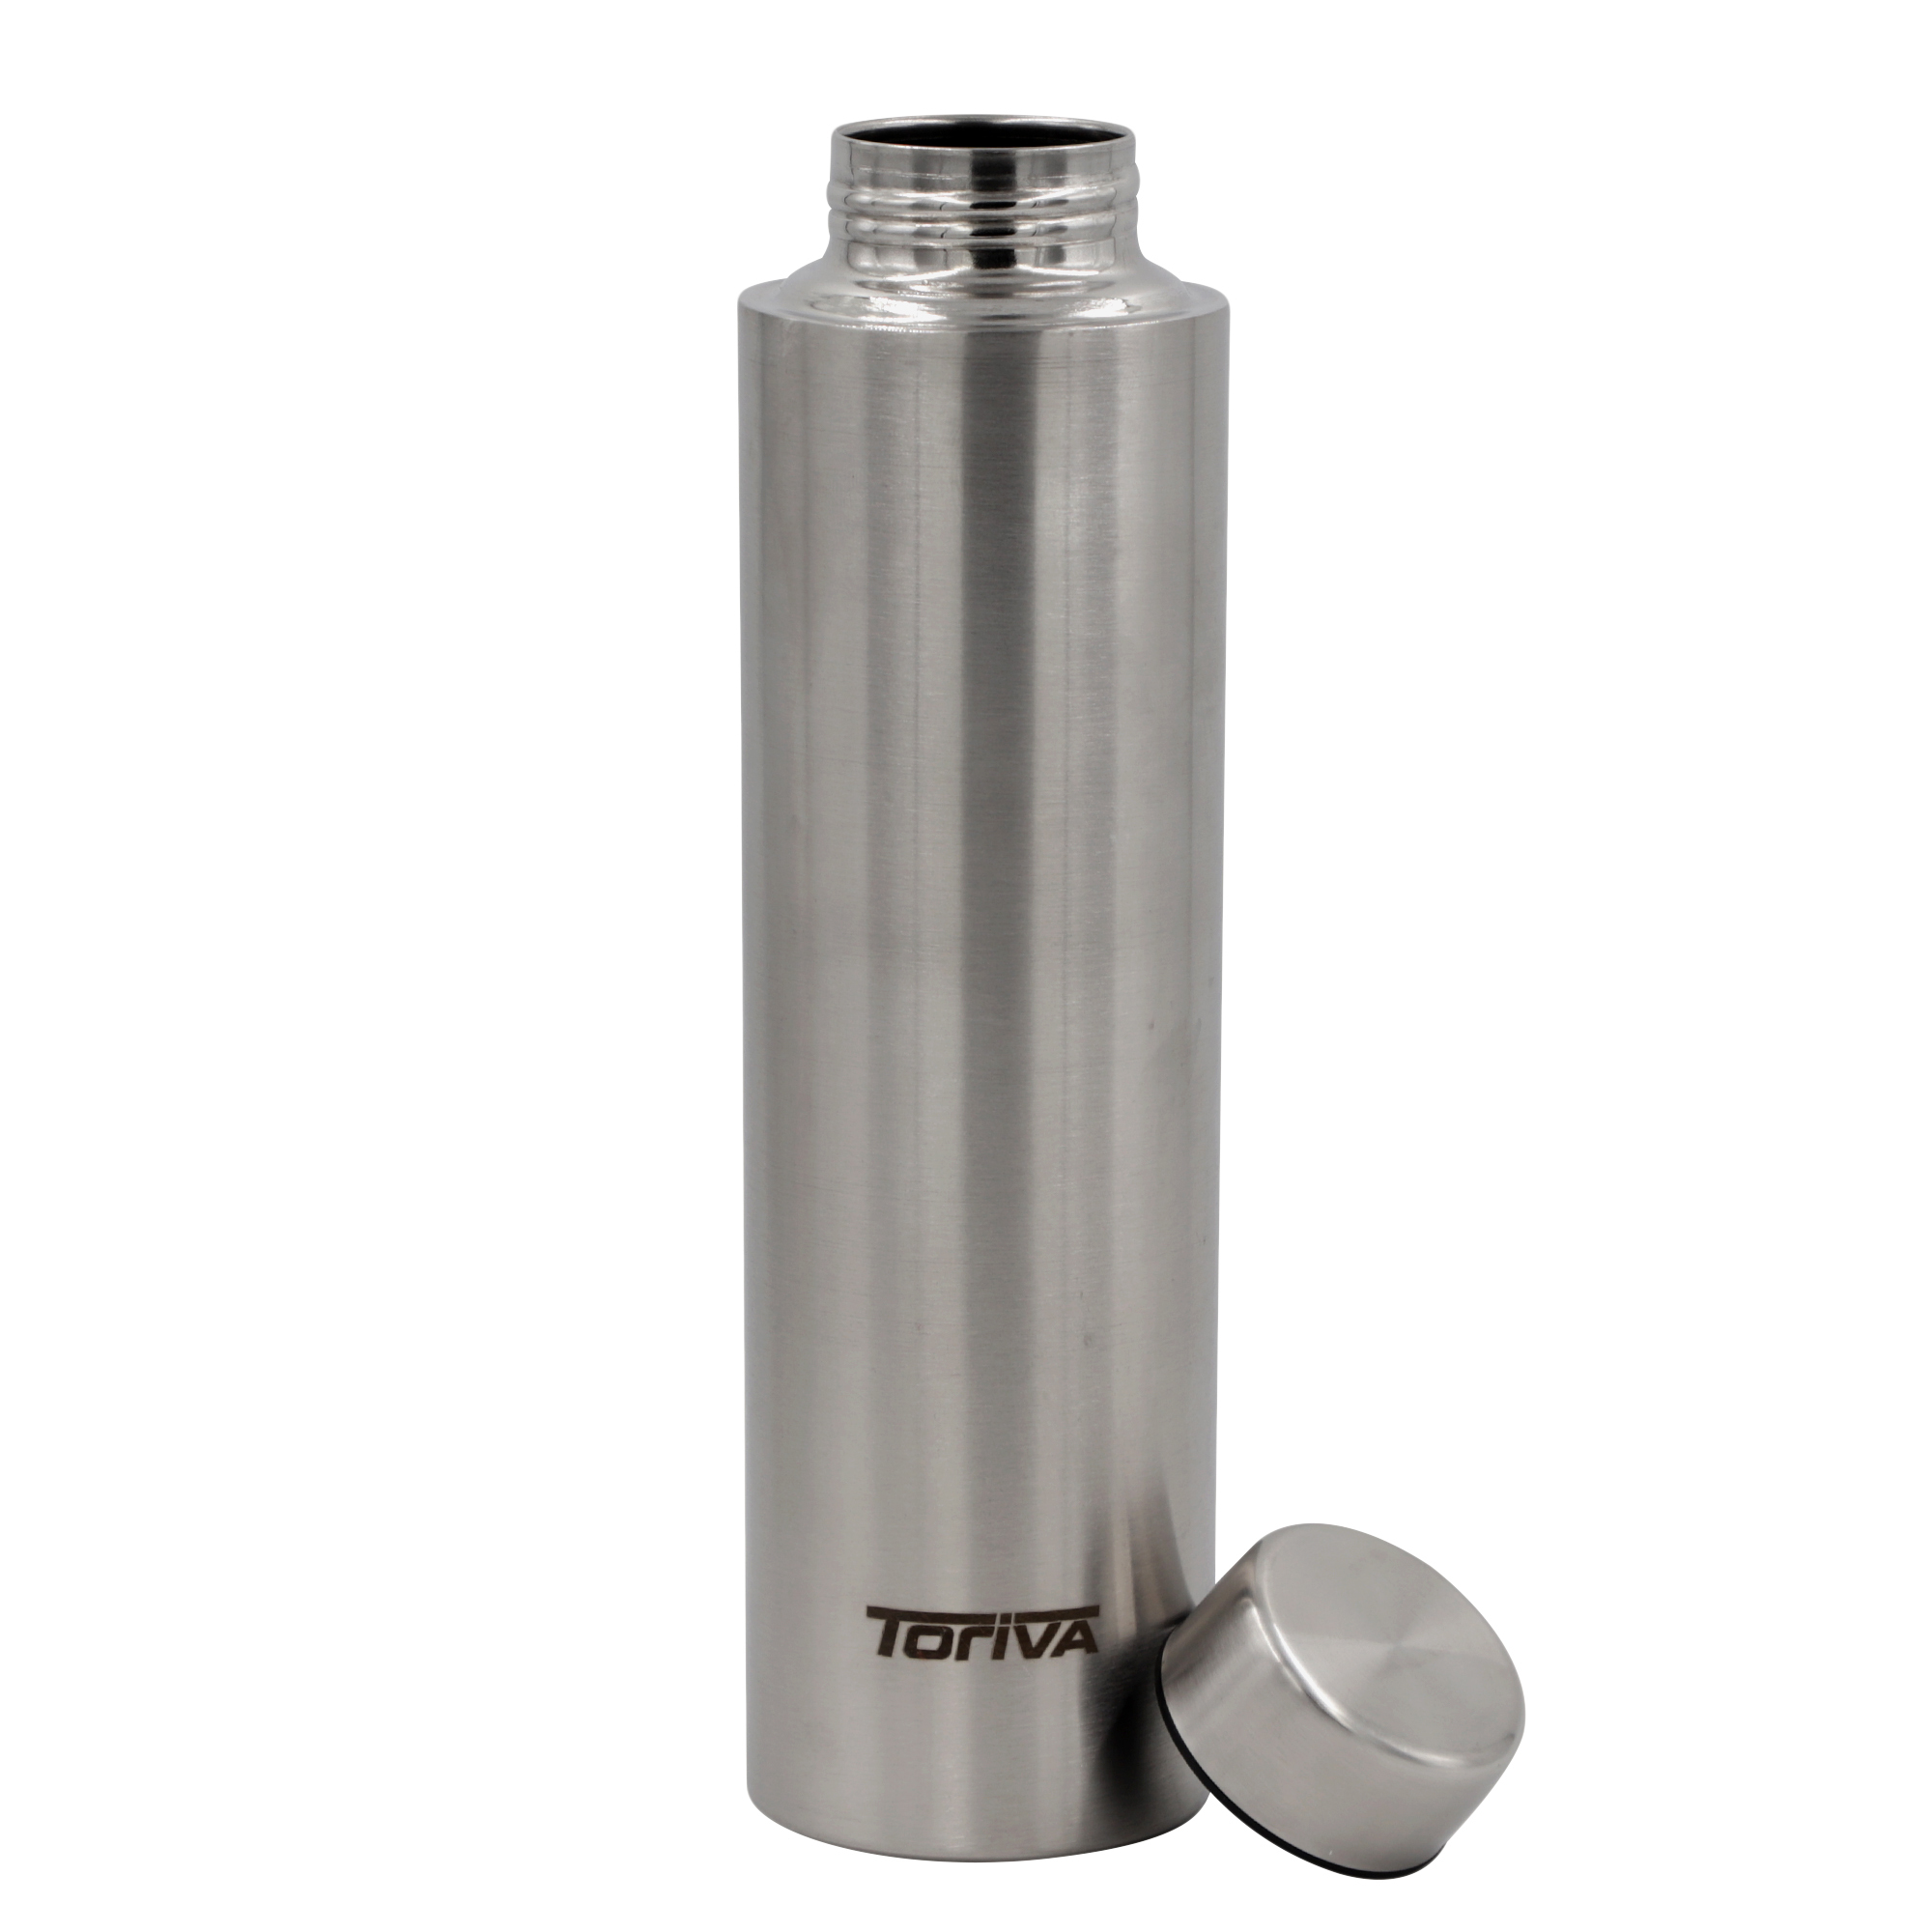 Toriva Fristo Stainless steel bottles